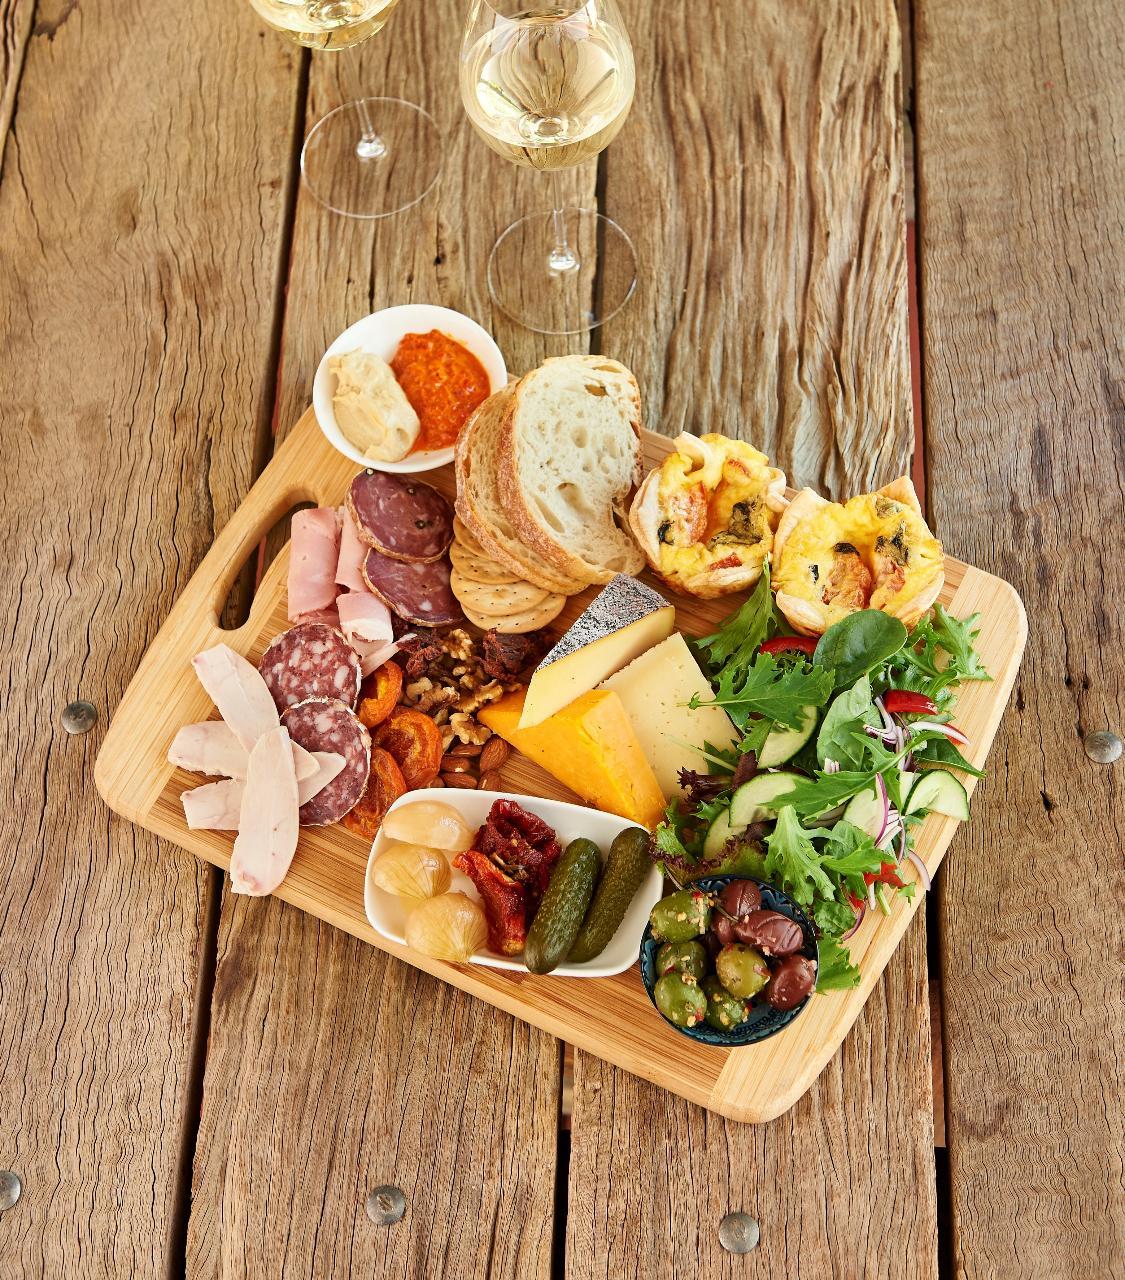 Faber Lunch Platter